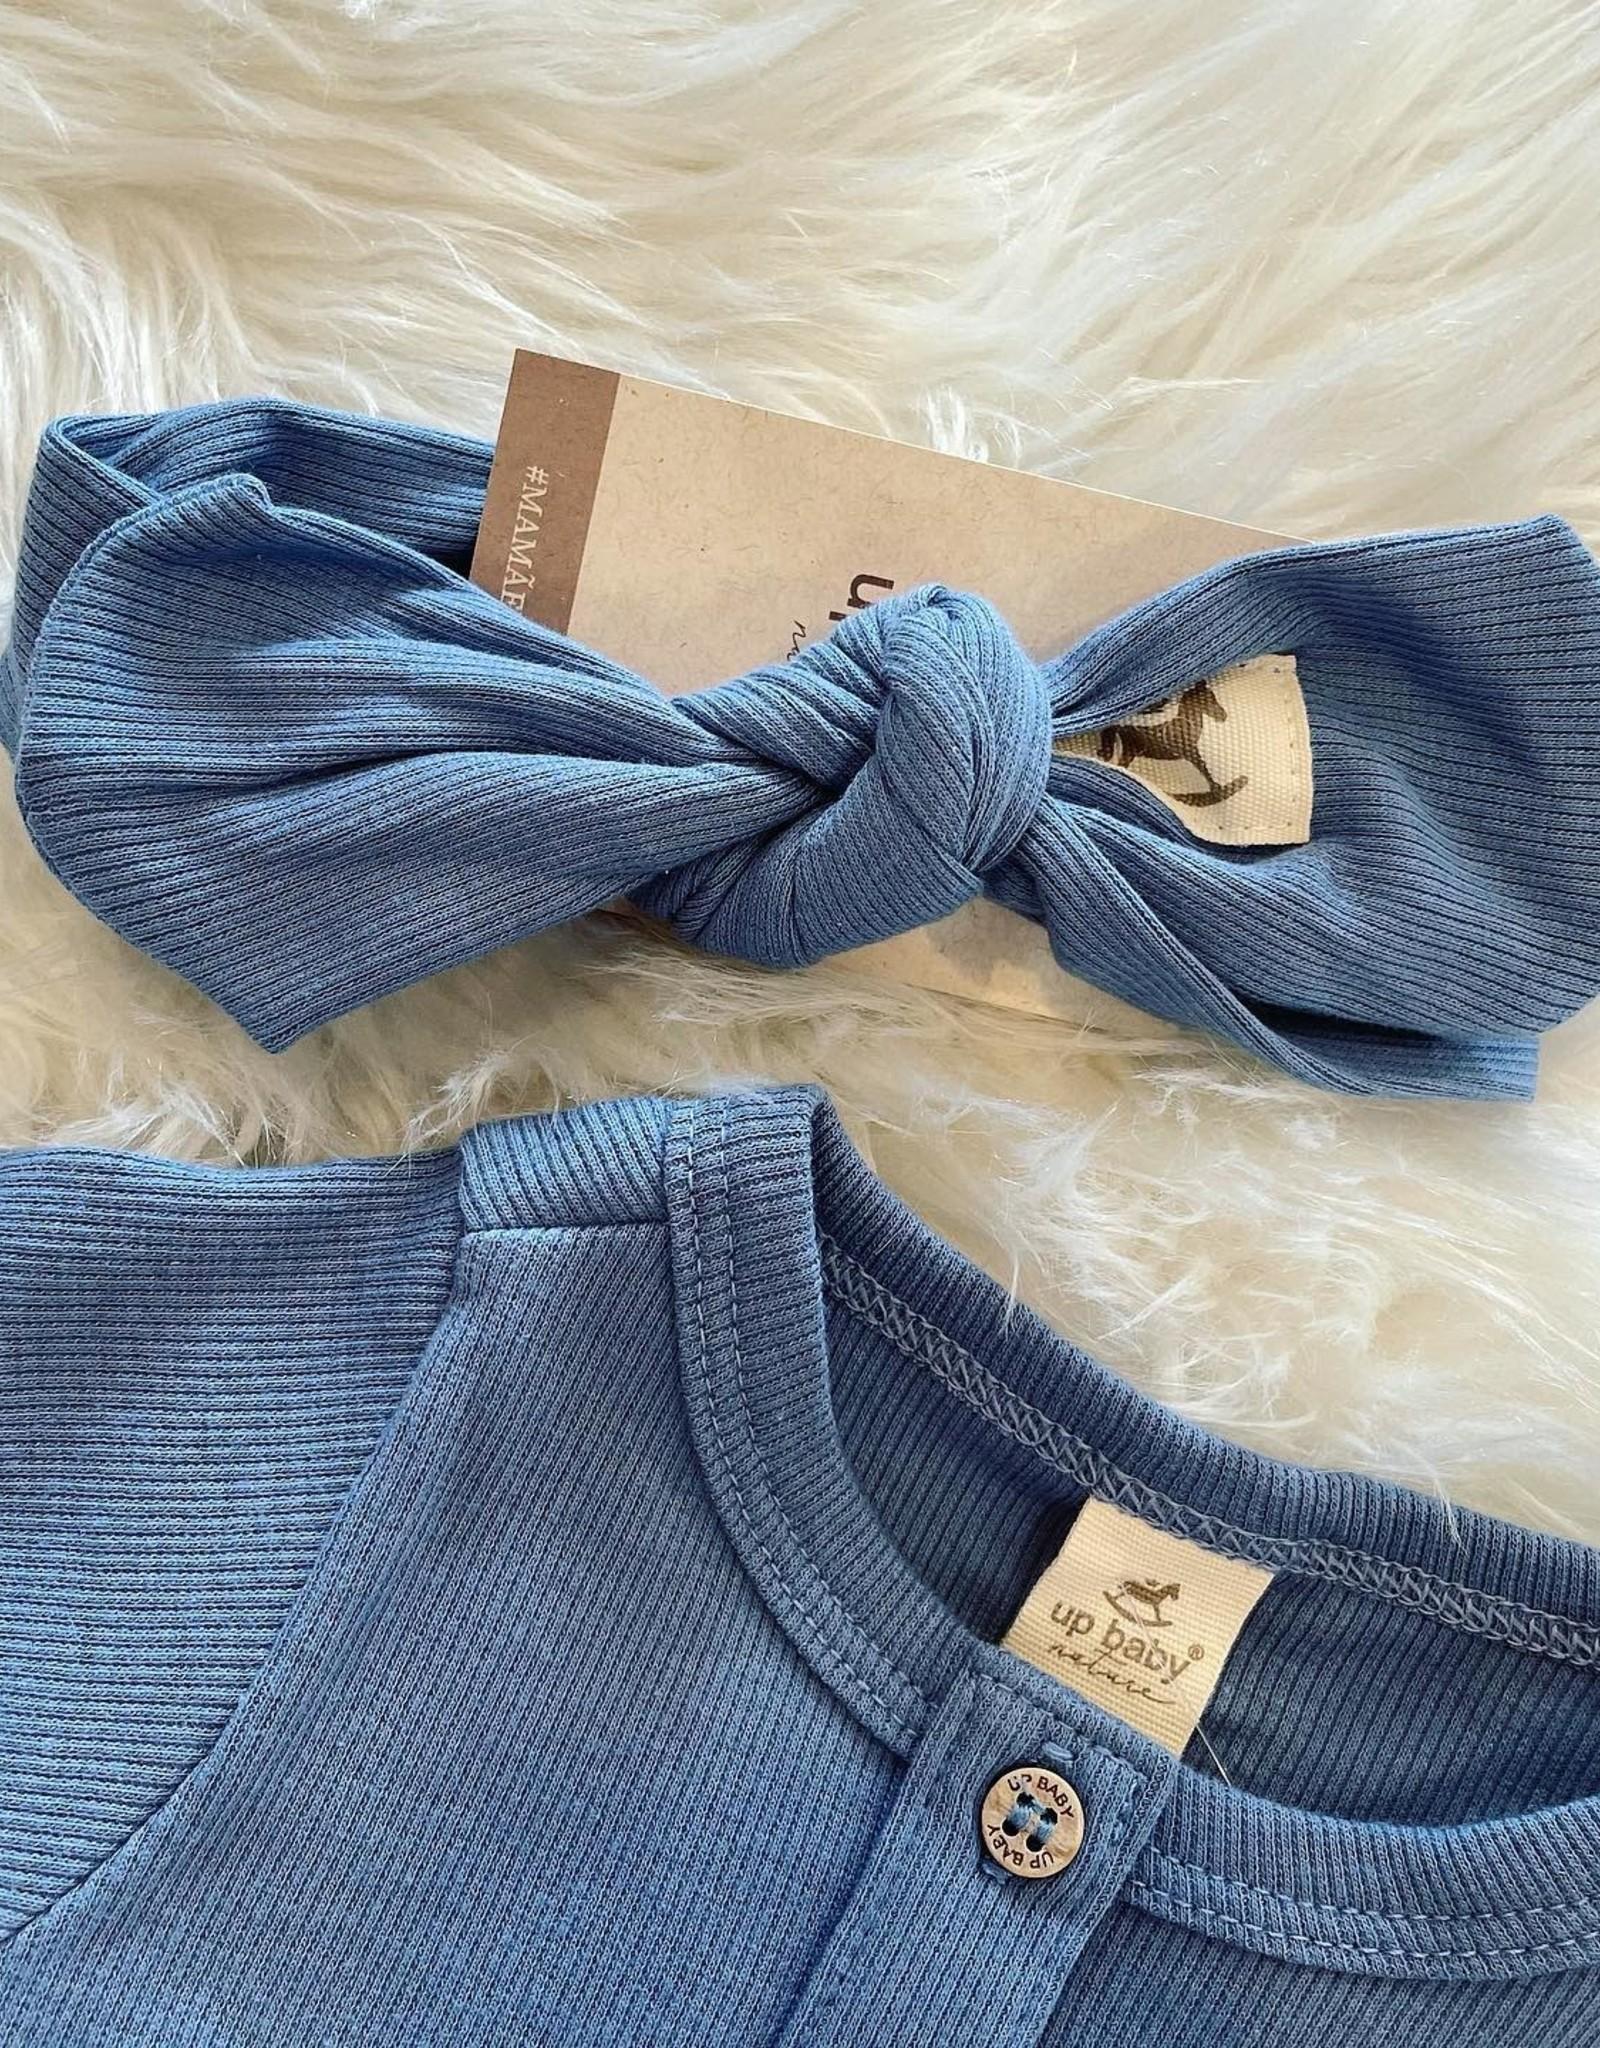 UpBaby Ribbed Headband in Blue